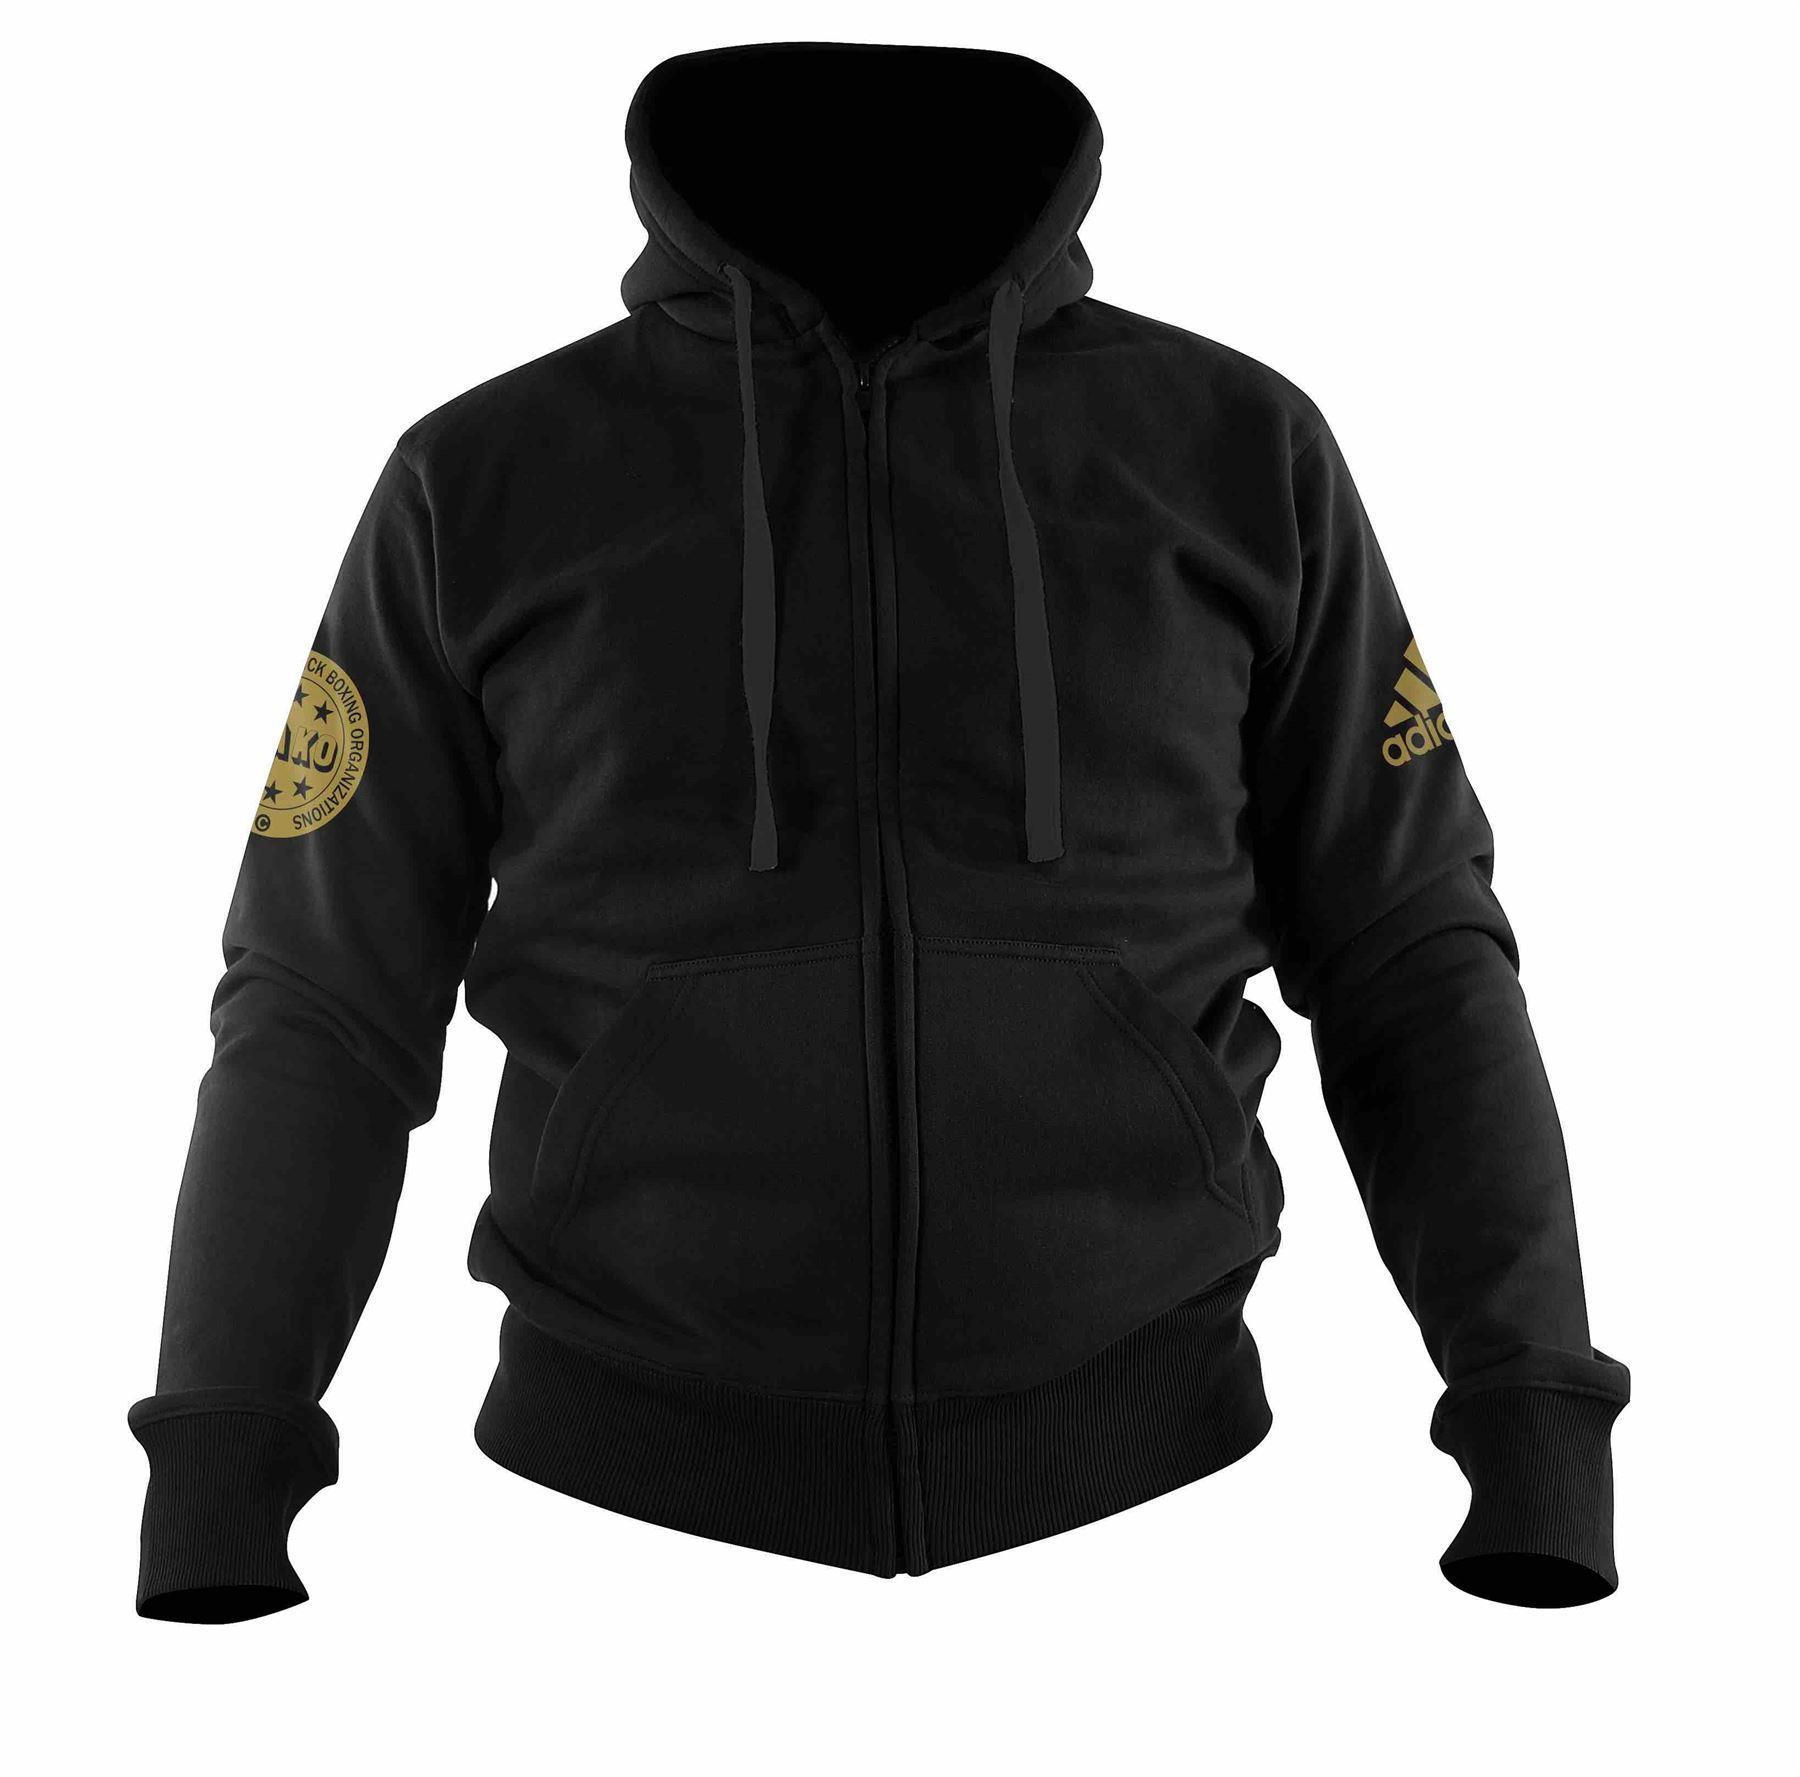 best website 572b5 e3d69 Adidas WAKO Kickboxing Hoody   Clothing   Leisurewear   Fight Equipment UK